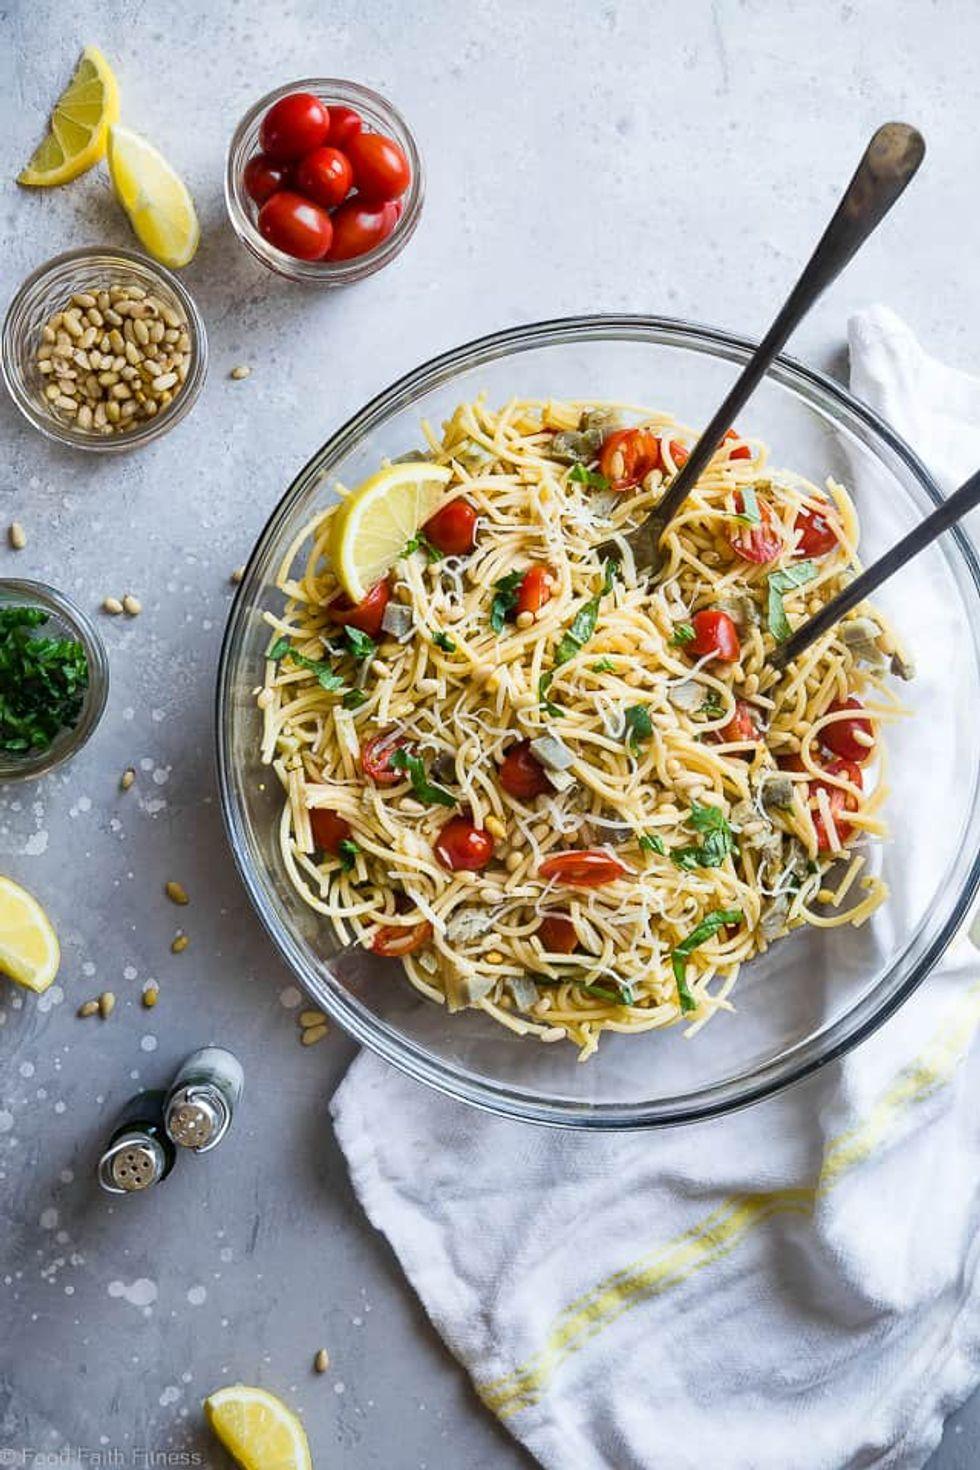 Vegan Gluten Free Pasta Salad with Artichokes and Lemon